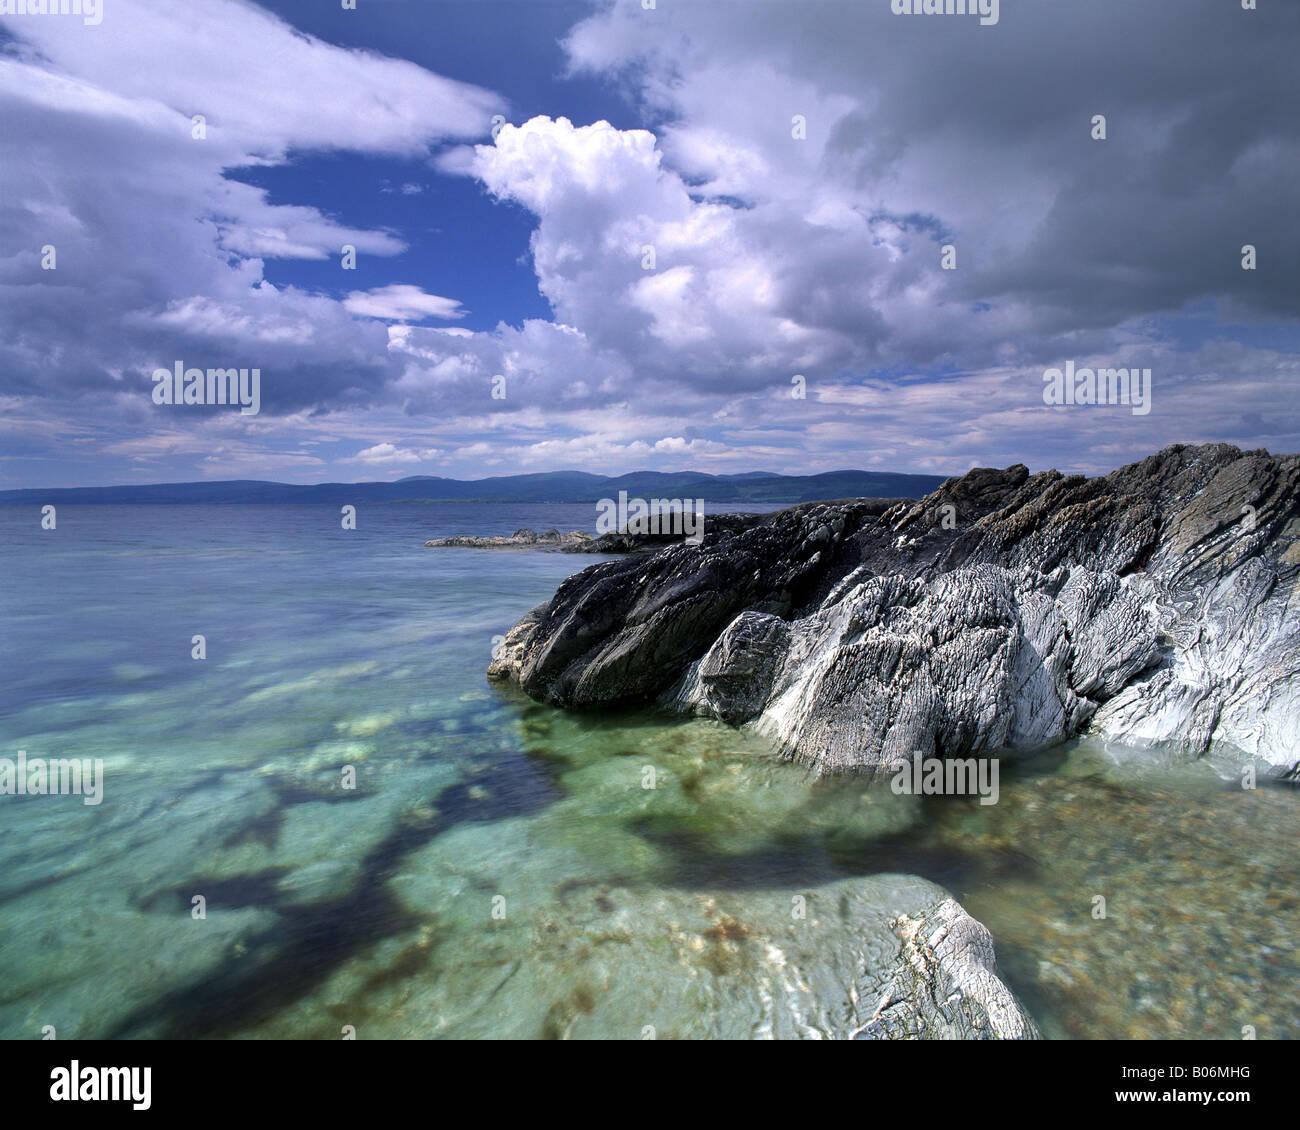 GB - SCOTLAND: Imachar Point on Isle of Arran - Stock Image